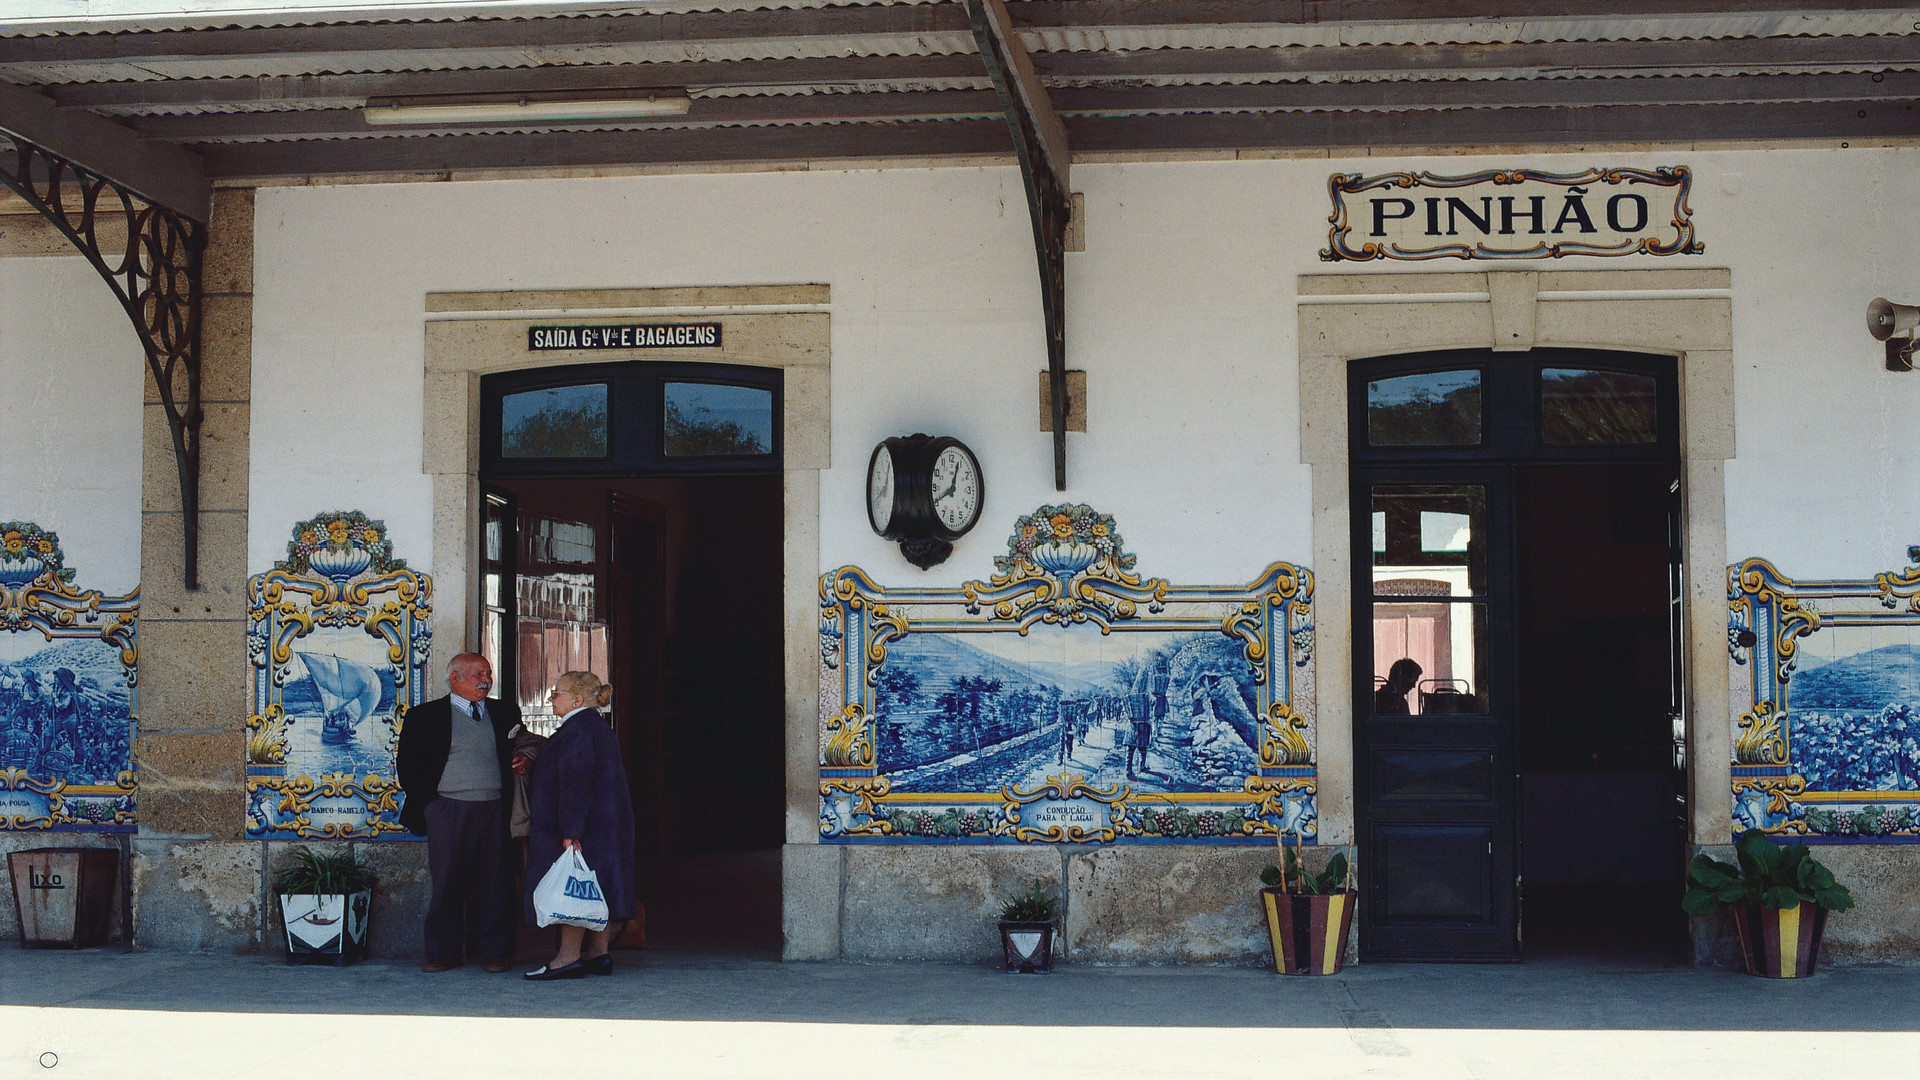 Station Pinhao, Portugal